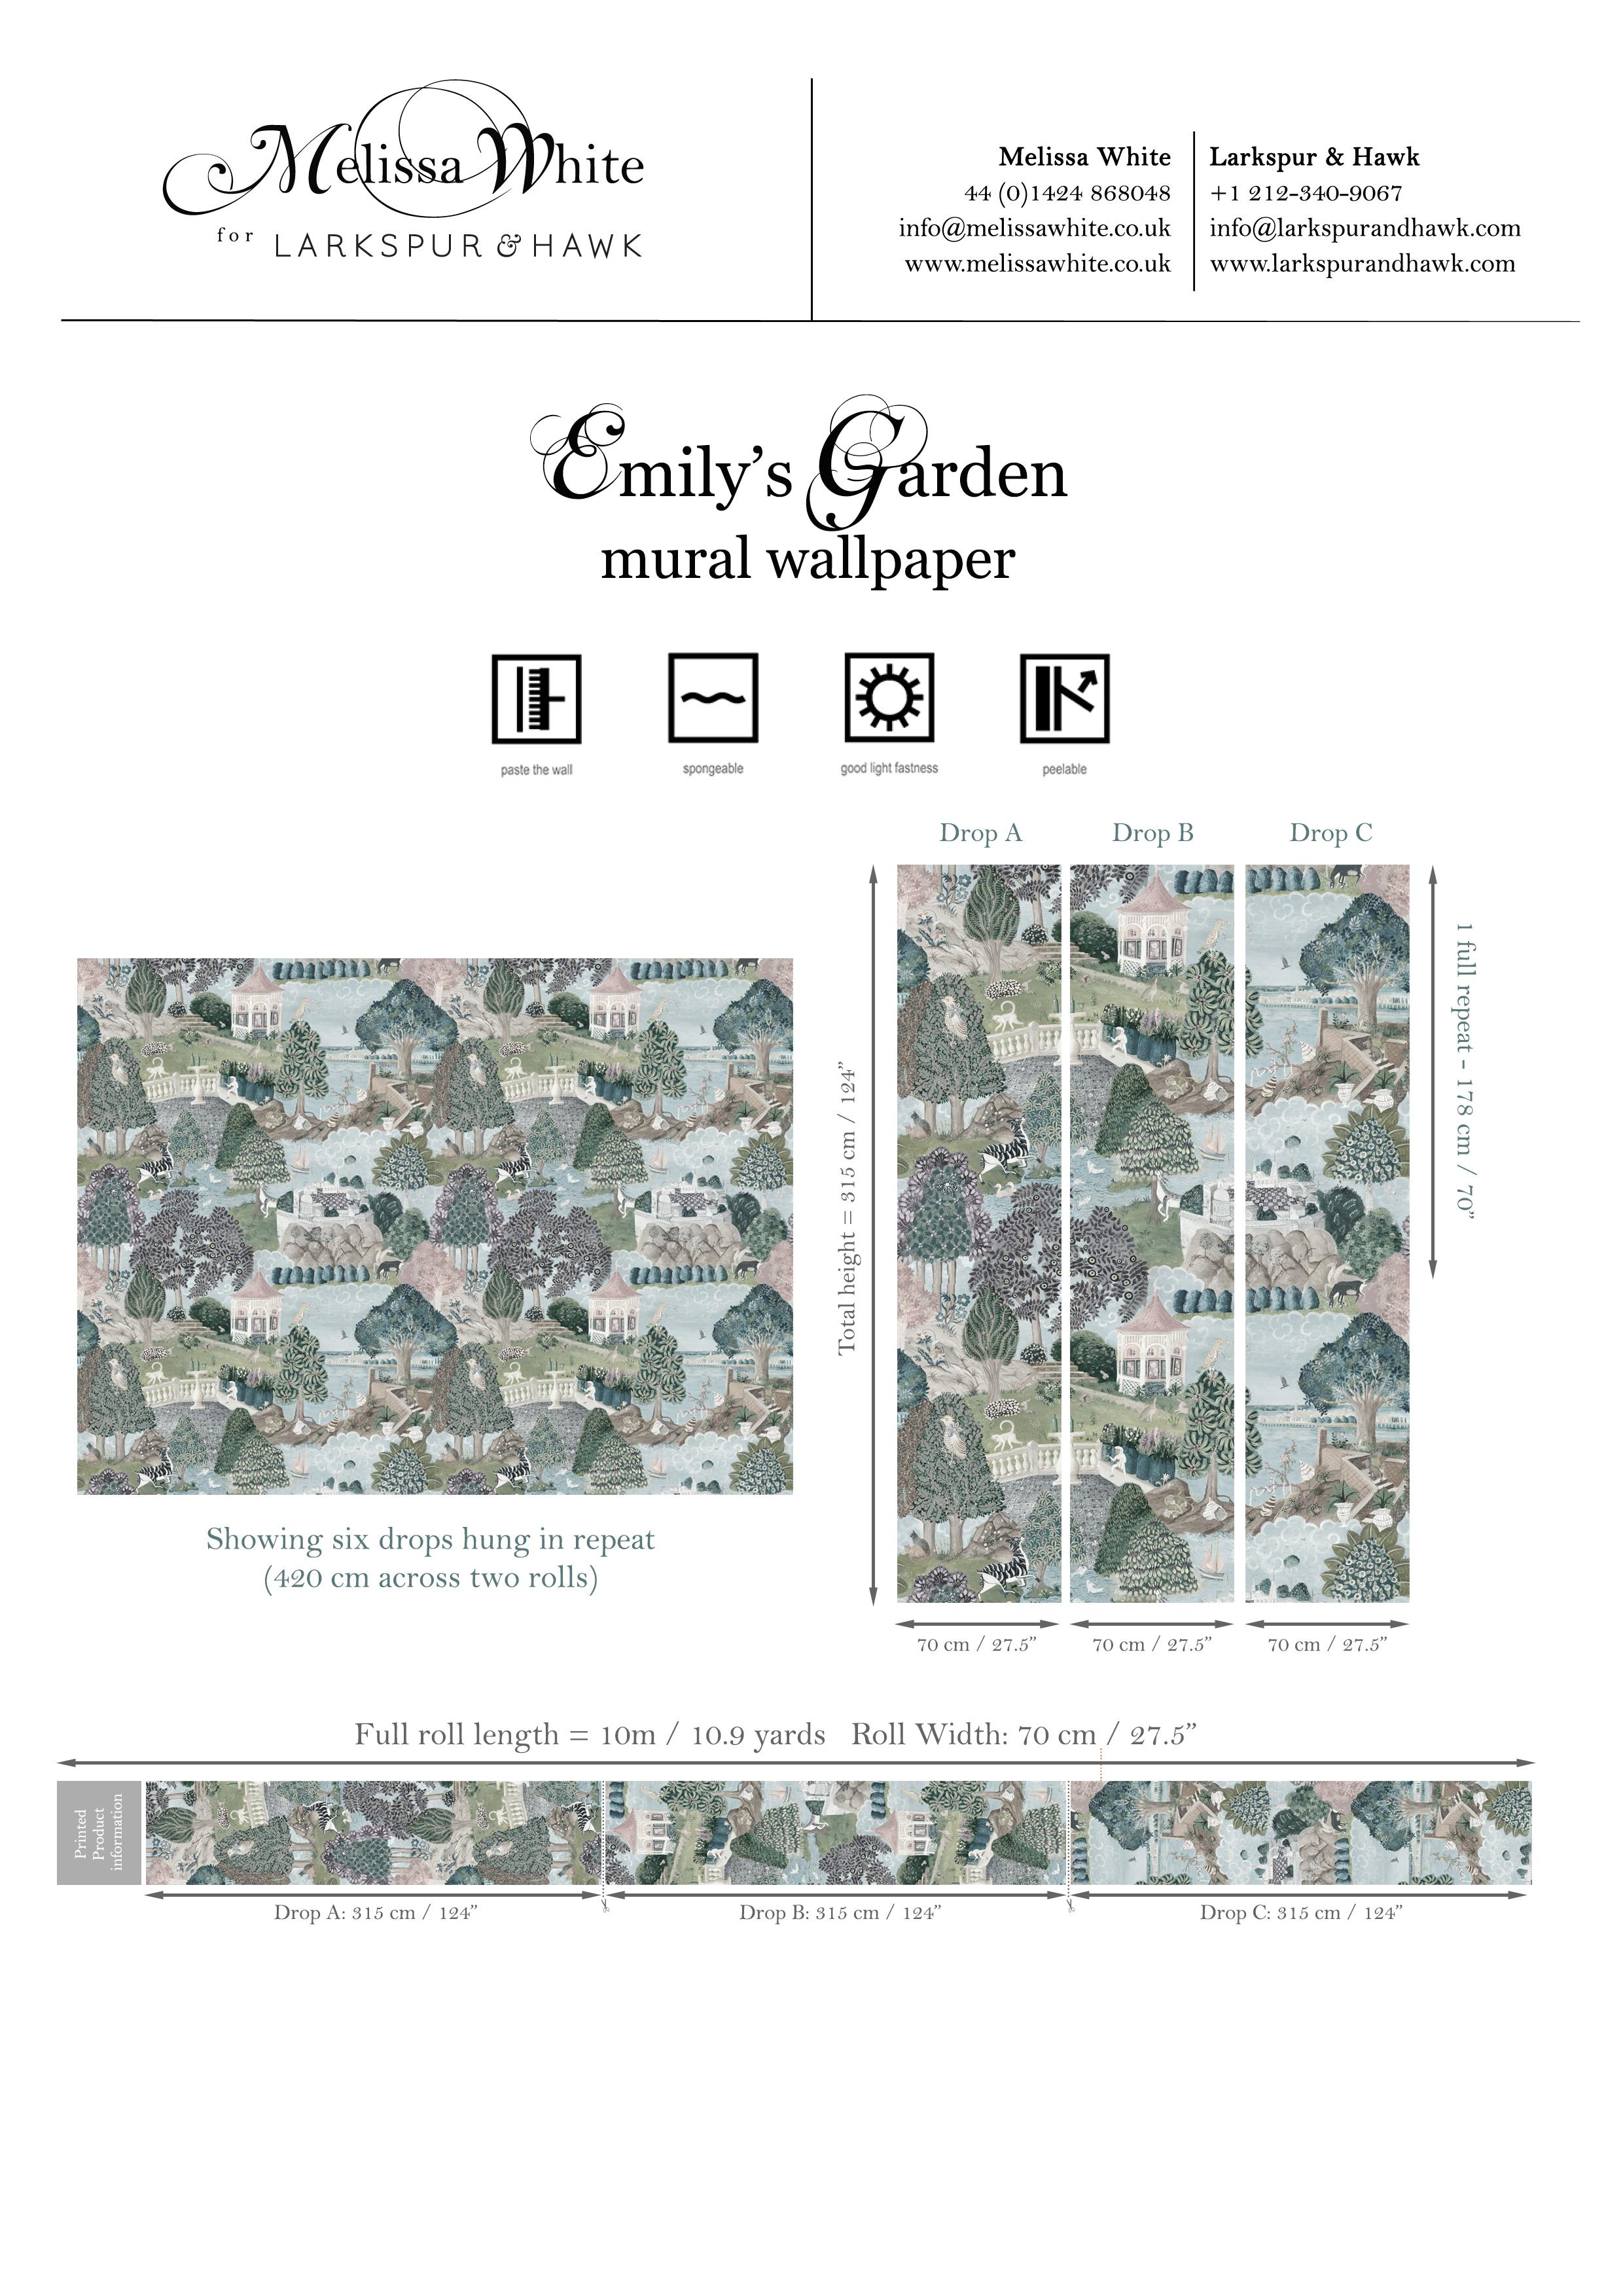 Emily's Garden Info Sheet p2 - roll info.jpg